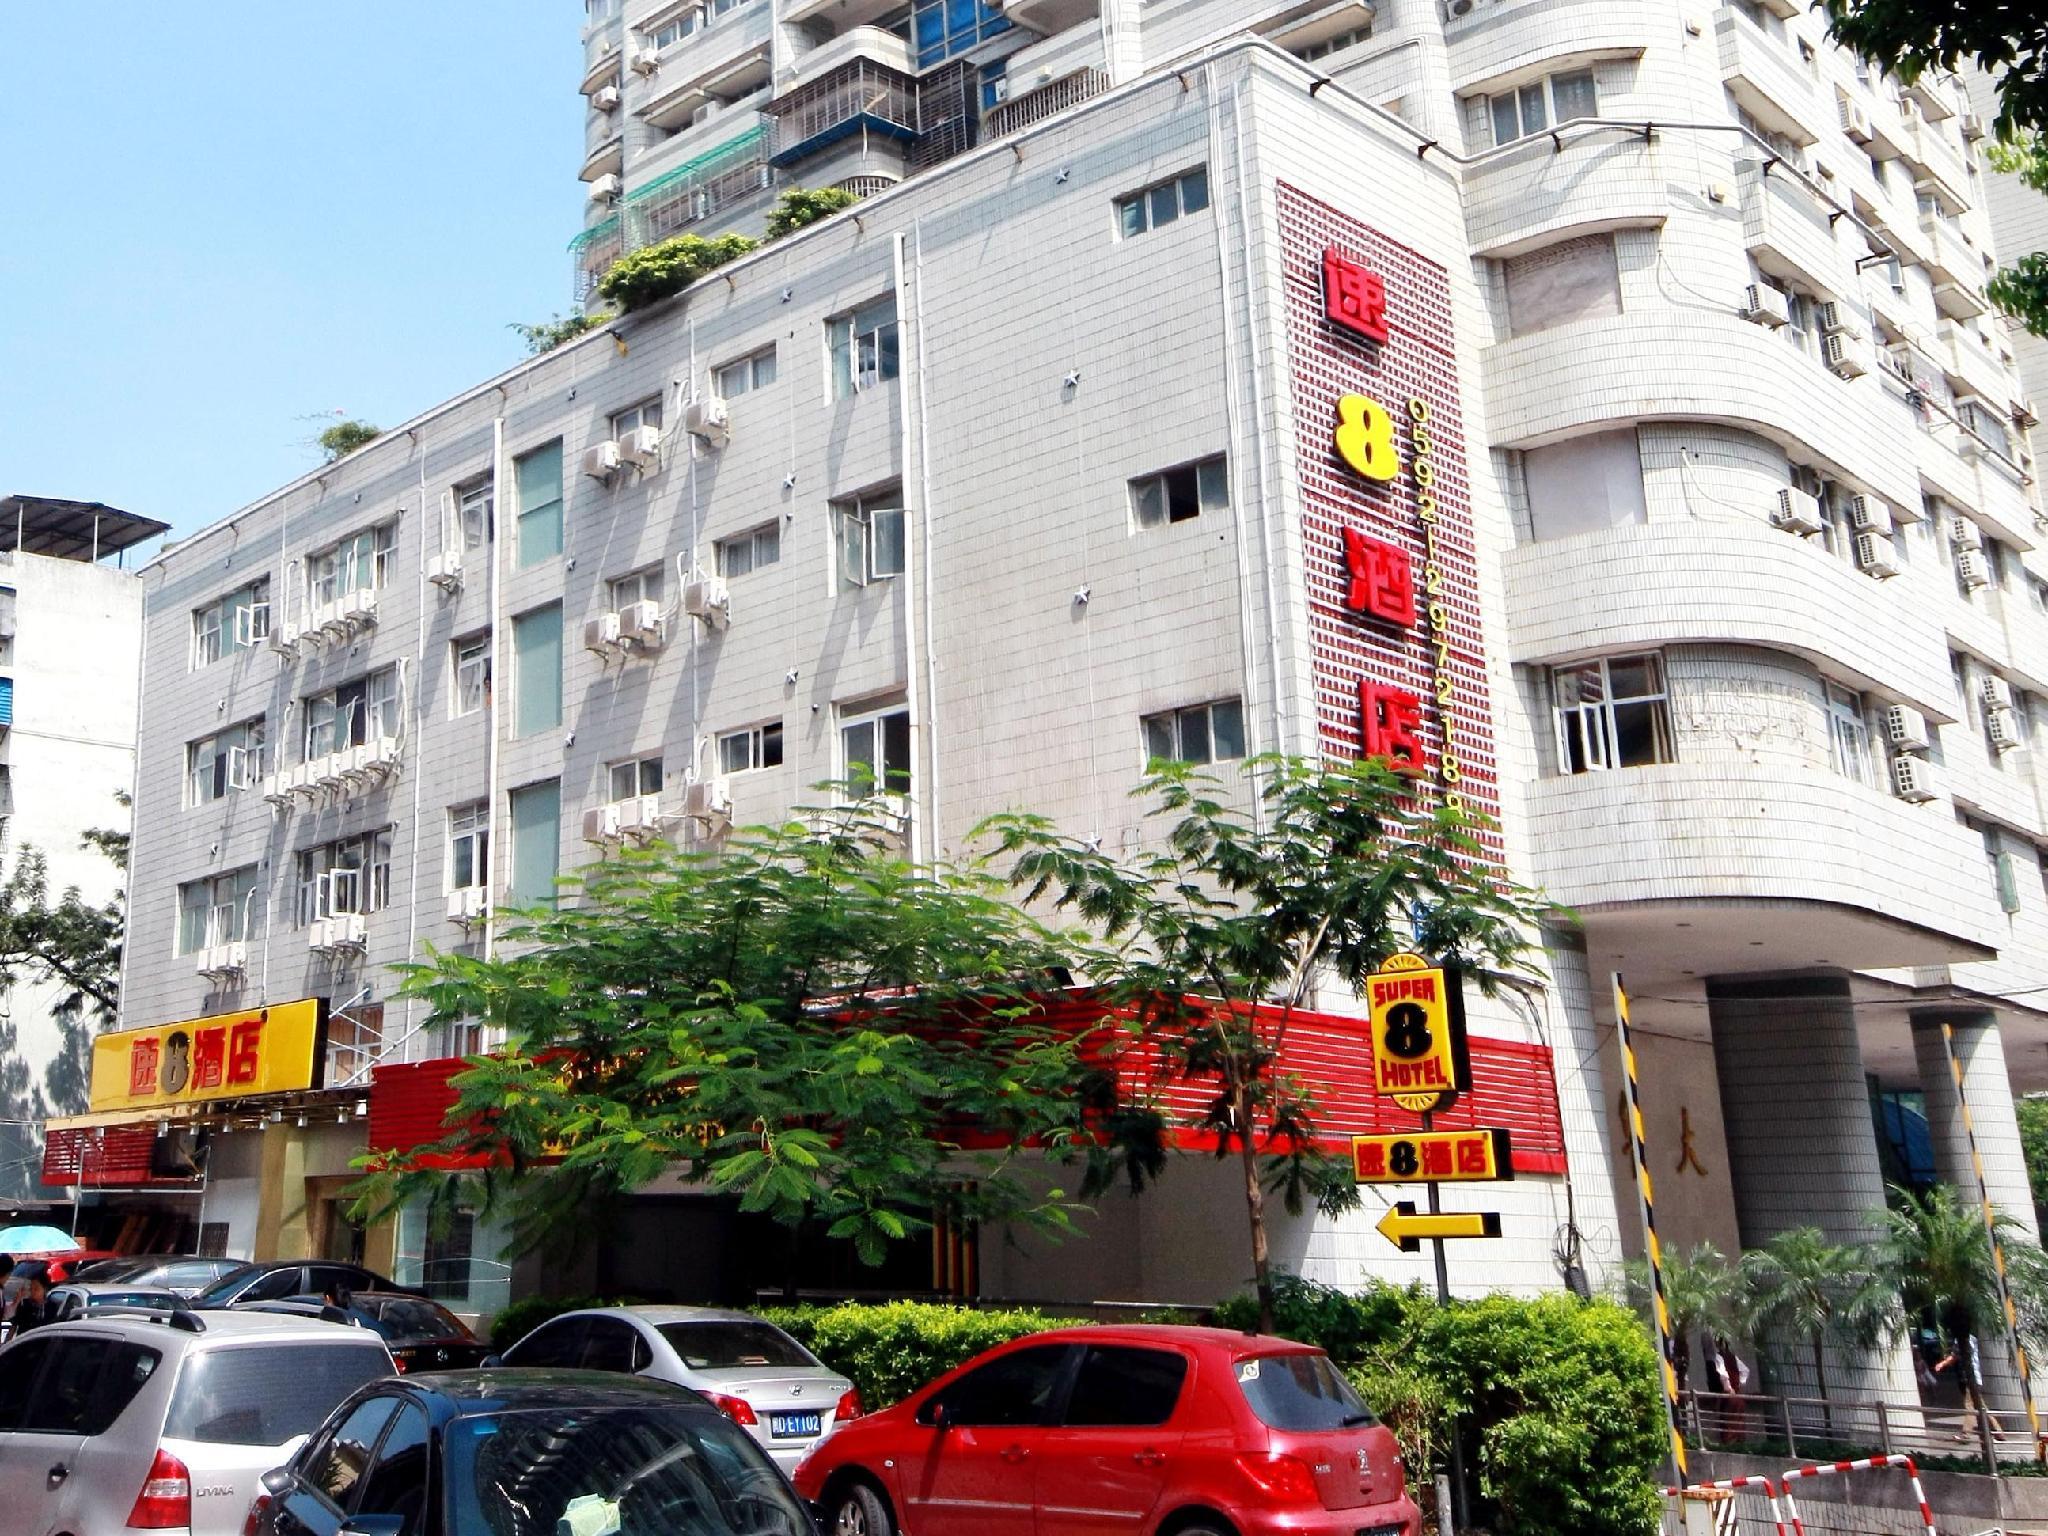 廈門速8酒店廈門光華大廈中山路店 (Super 8 Hotel Xiamen Guanghua Tower Zhongshan Road Branch)線上訂房 Agoda.com